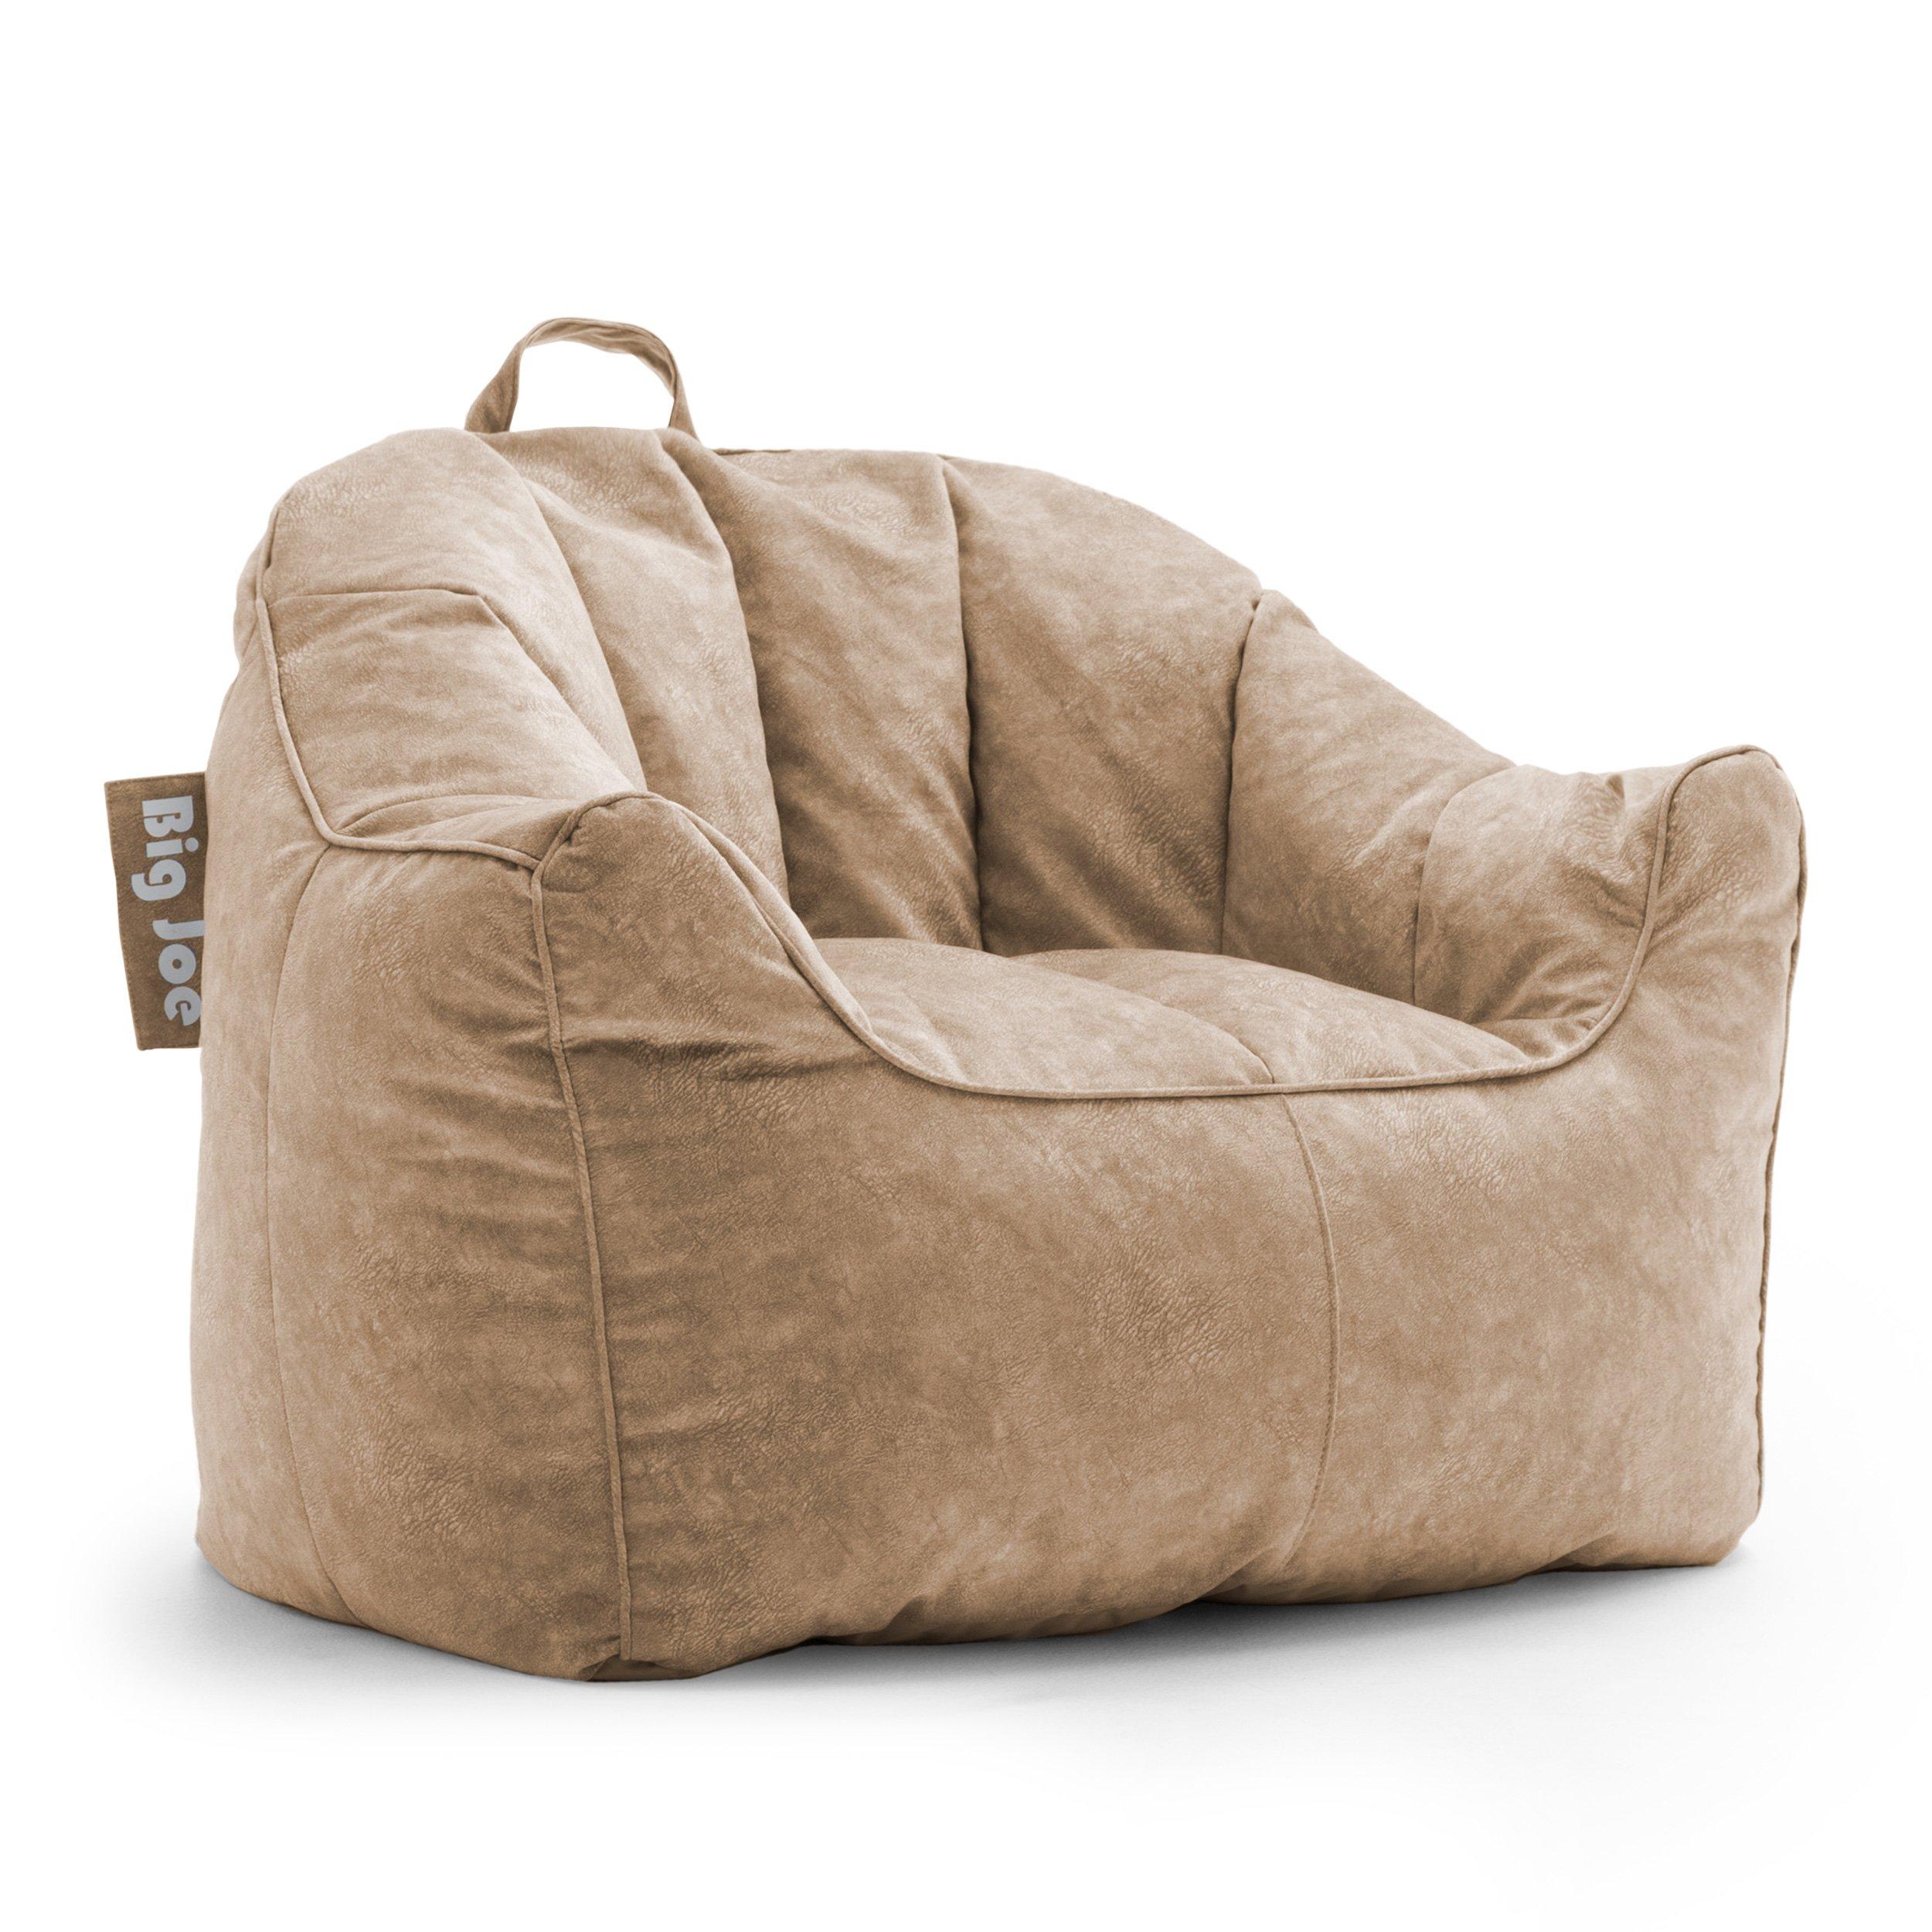 Big Joe Aloha Chair, Fawn by Big Joe